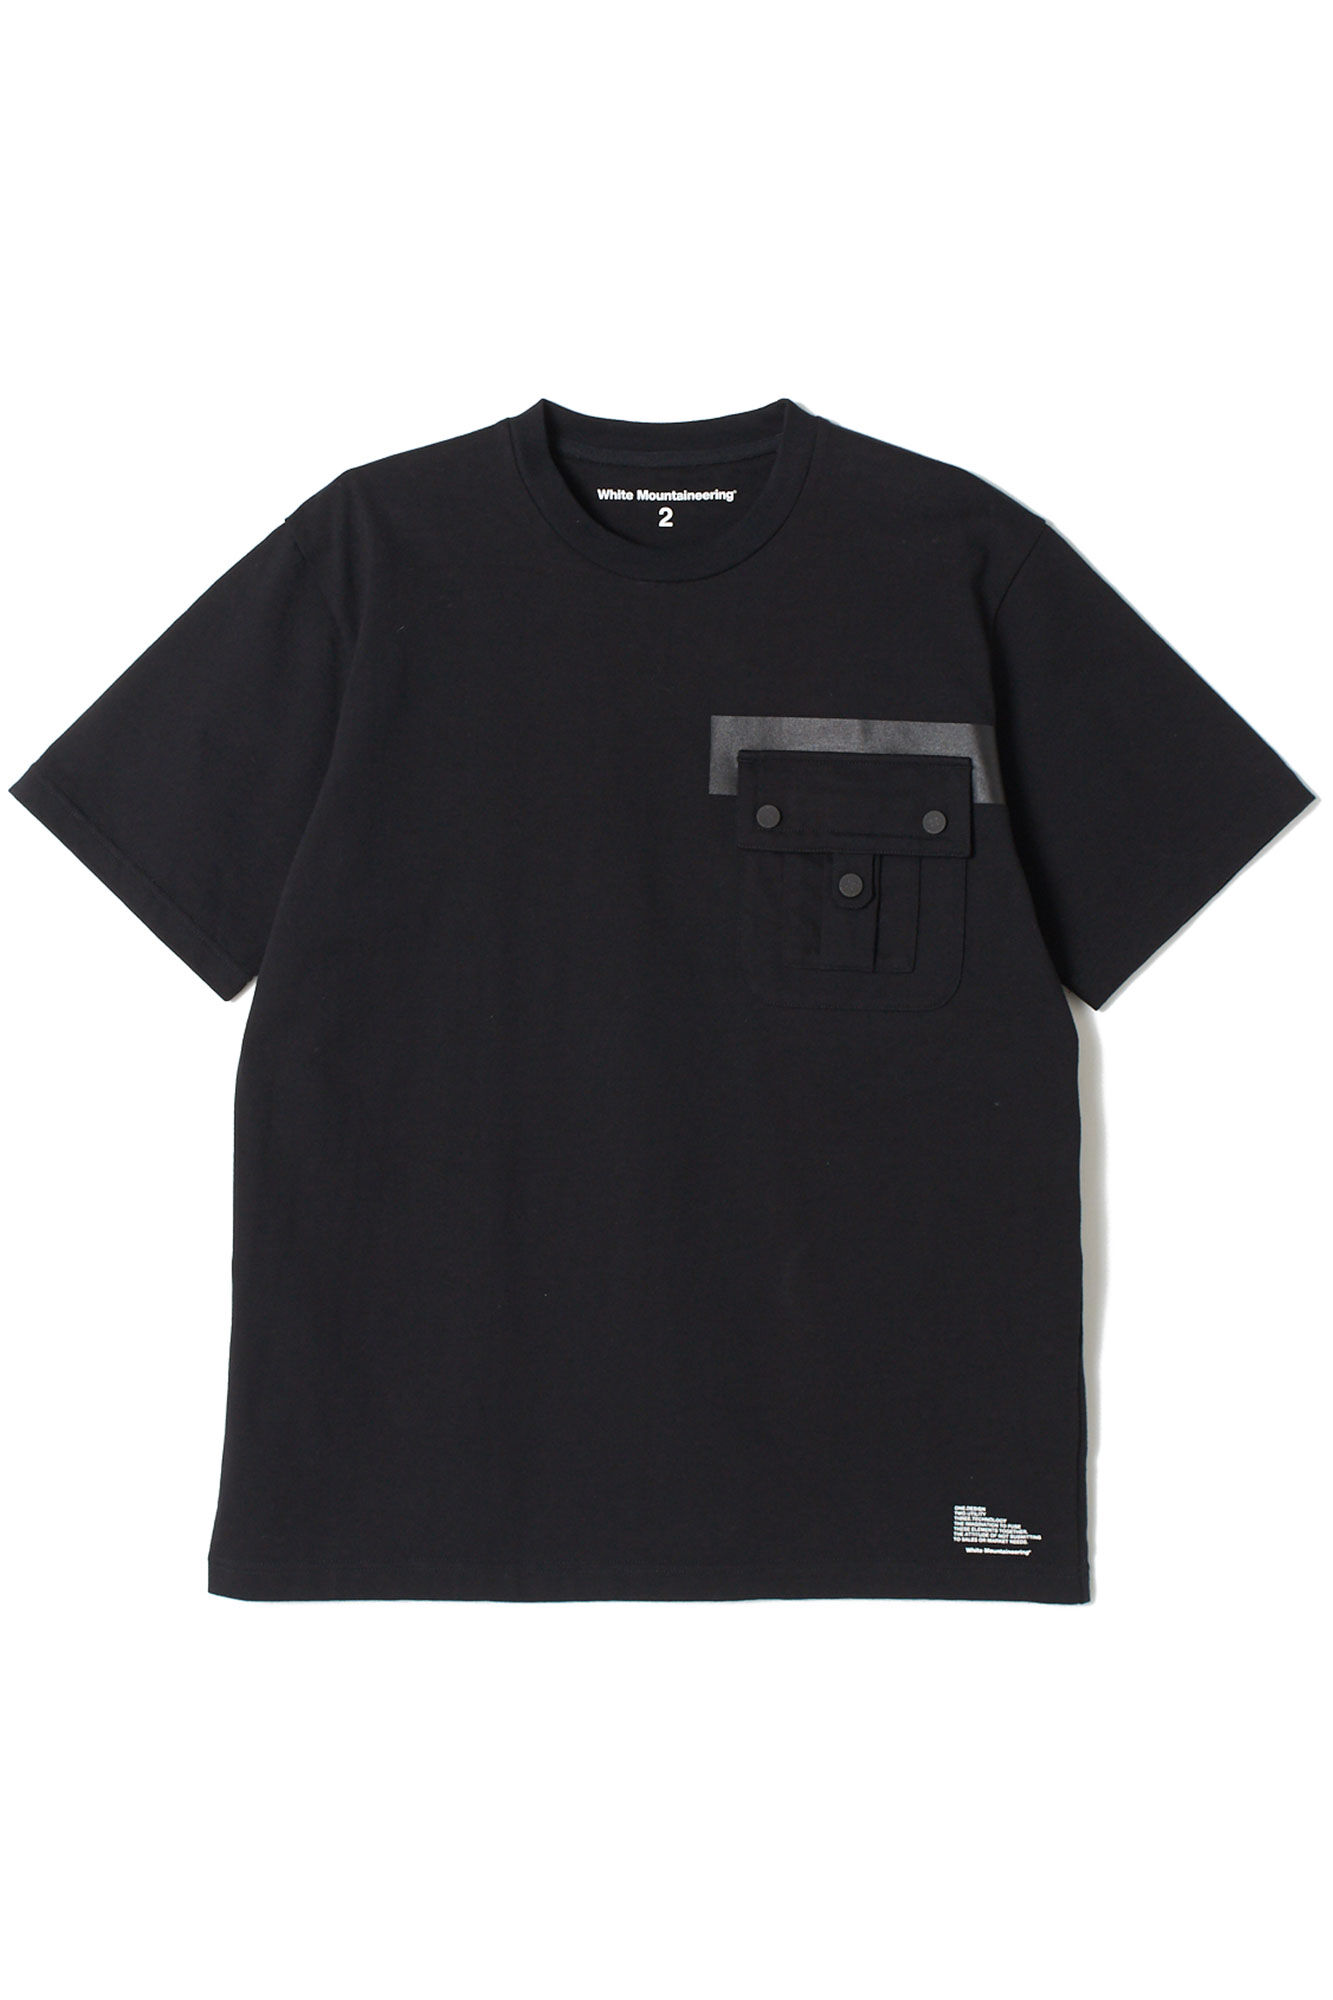 Big pocket tshirt WM1973504, BLACK BLCK